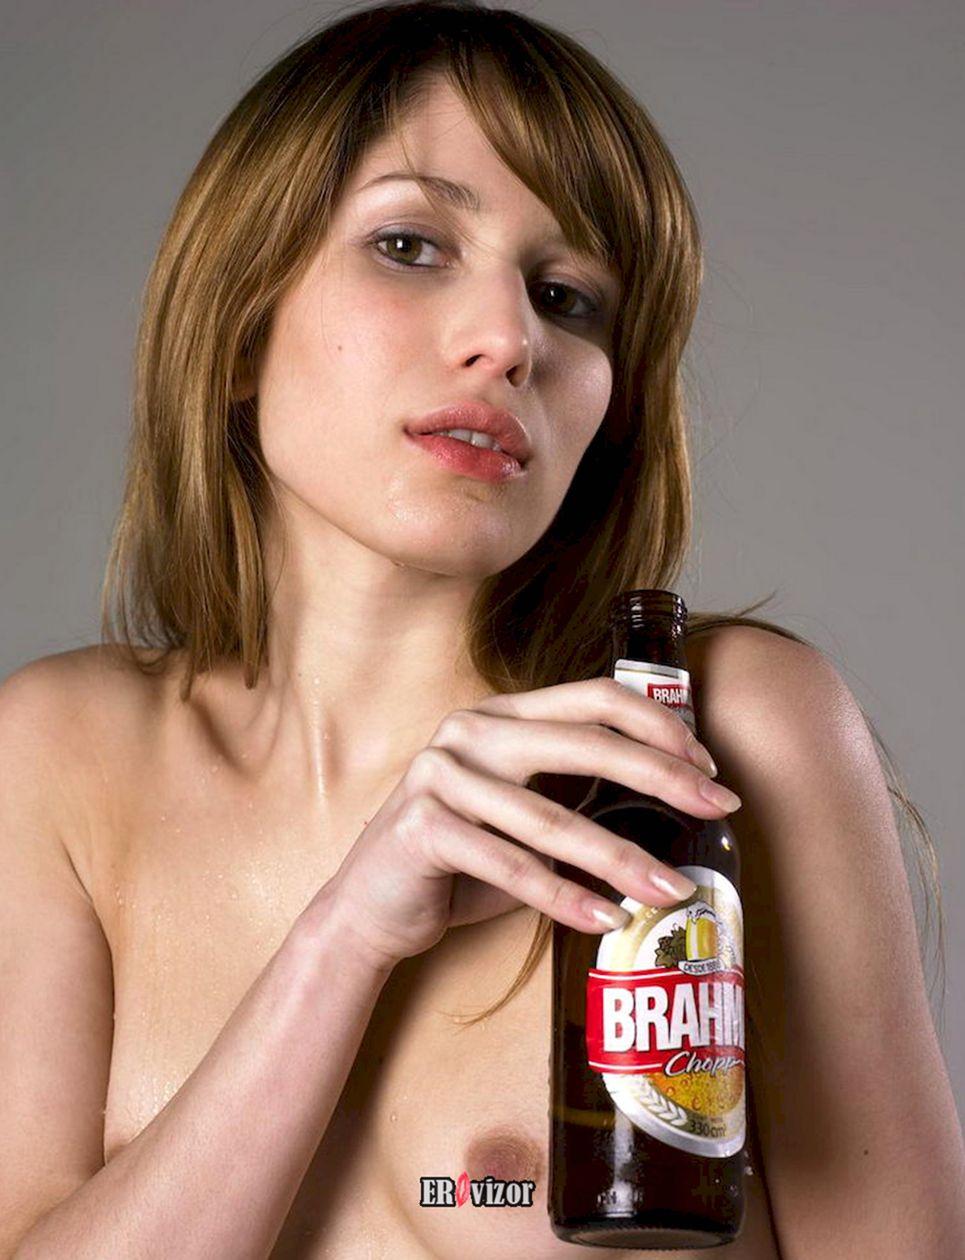 beer_naked women (14)